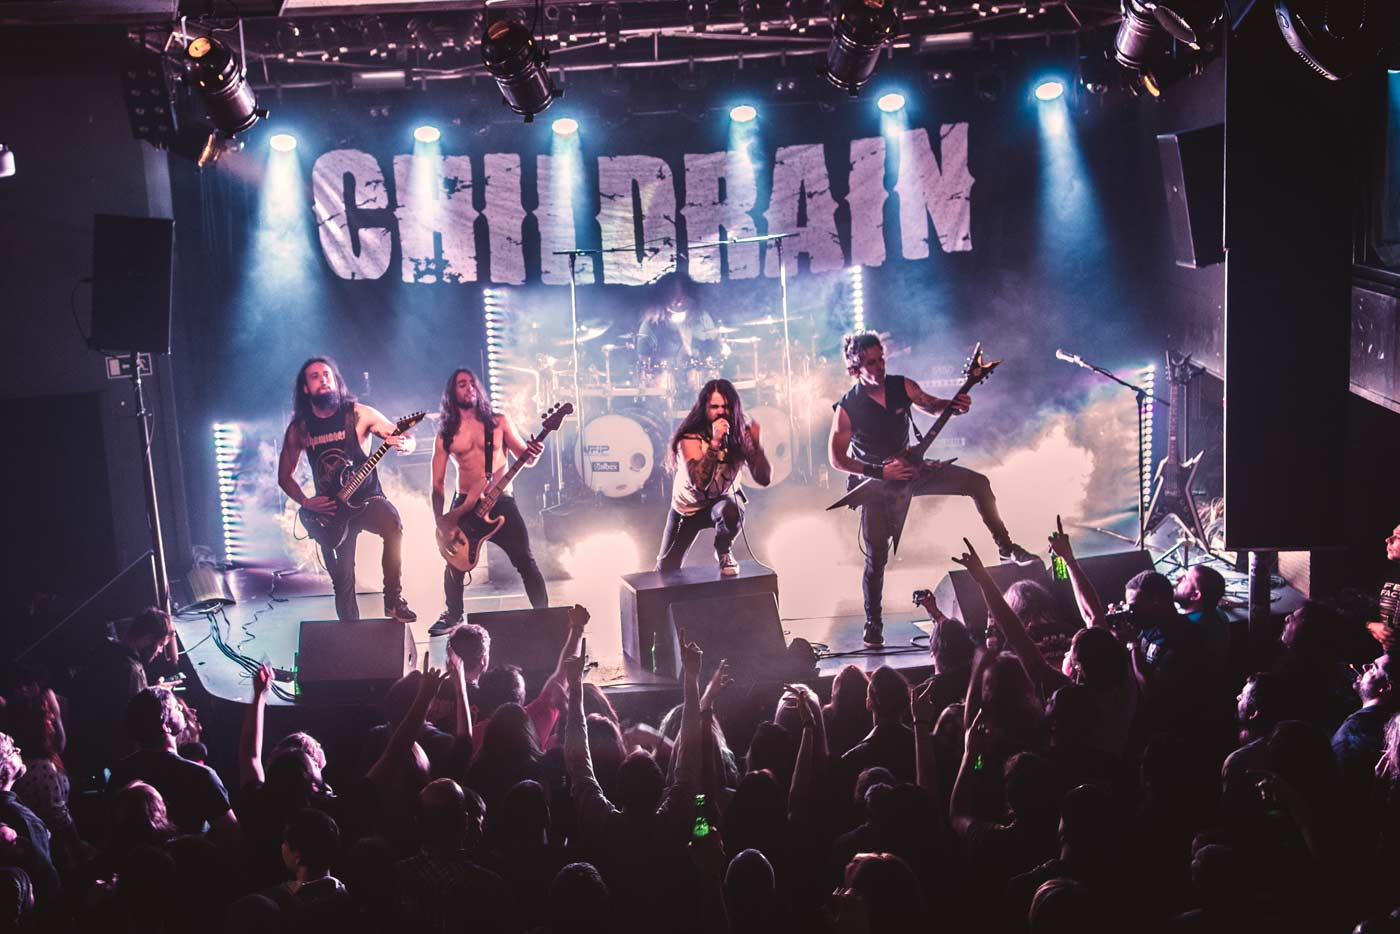 Childrain